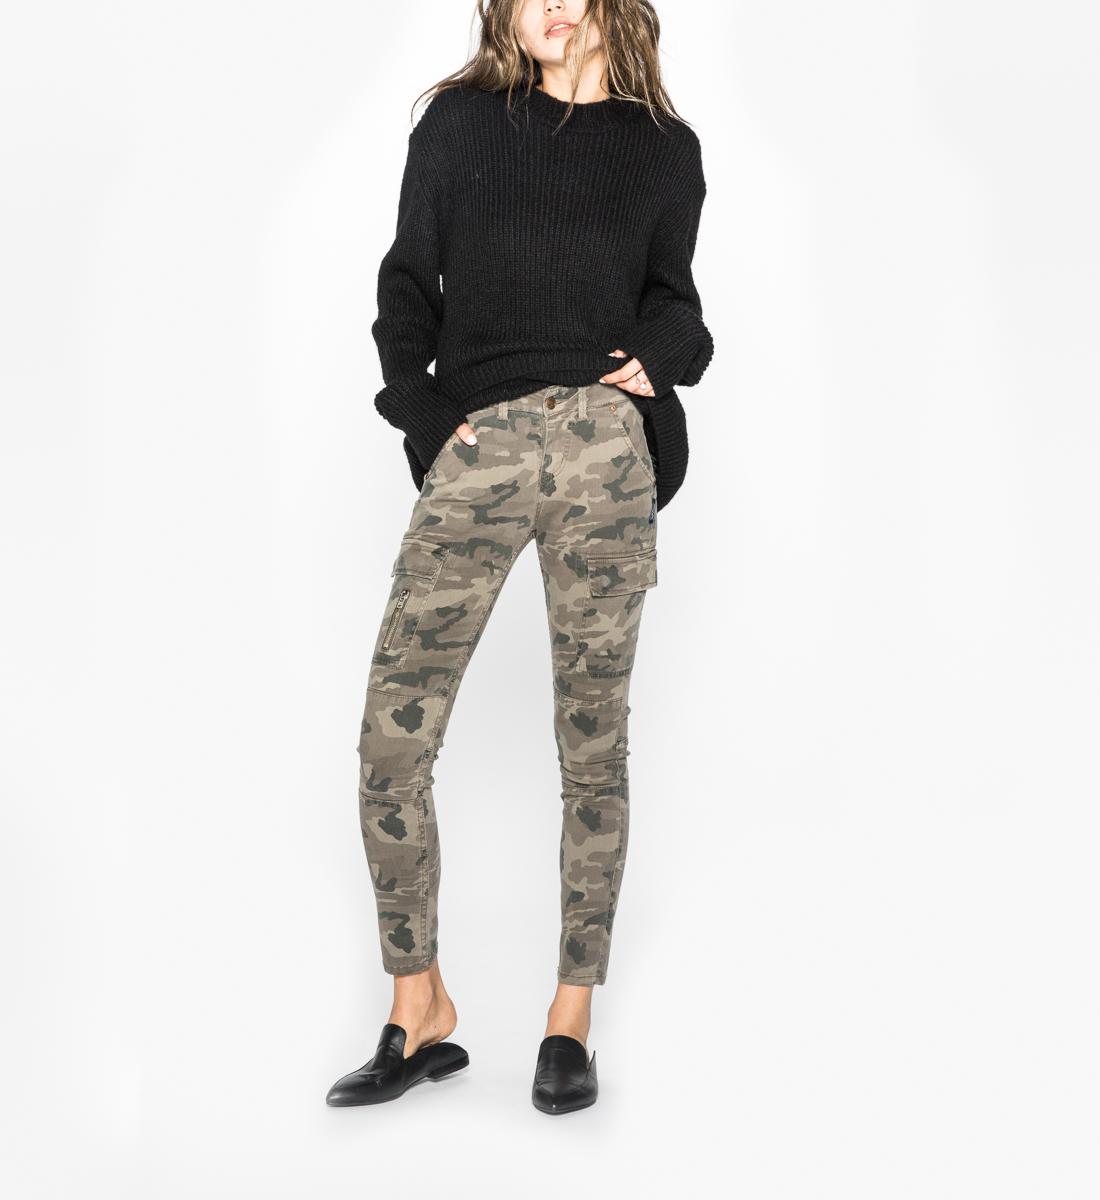 30b1a8f4 Skinny Cargo Mid Rise Skinny Leg Pants, Olive Camo, hi-res